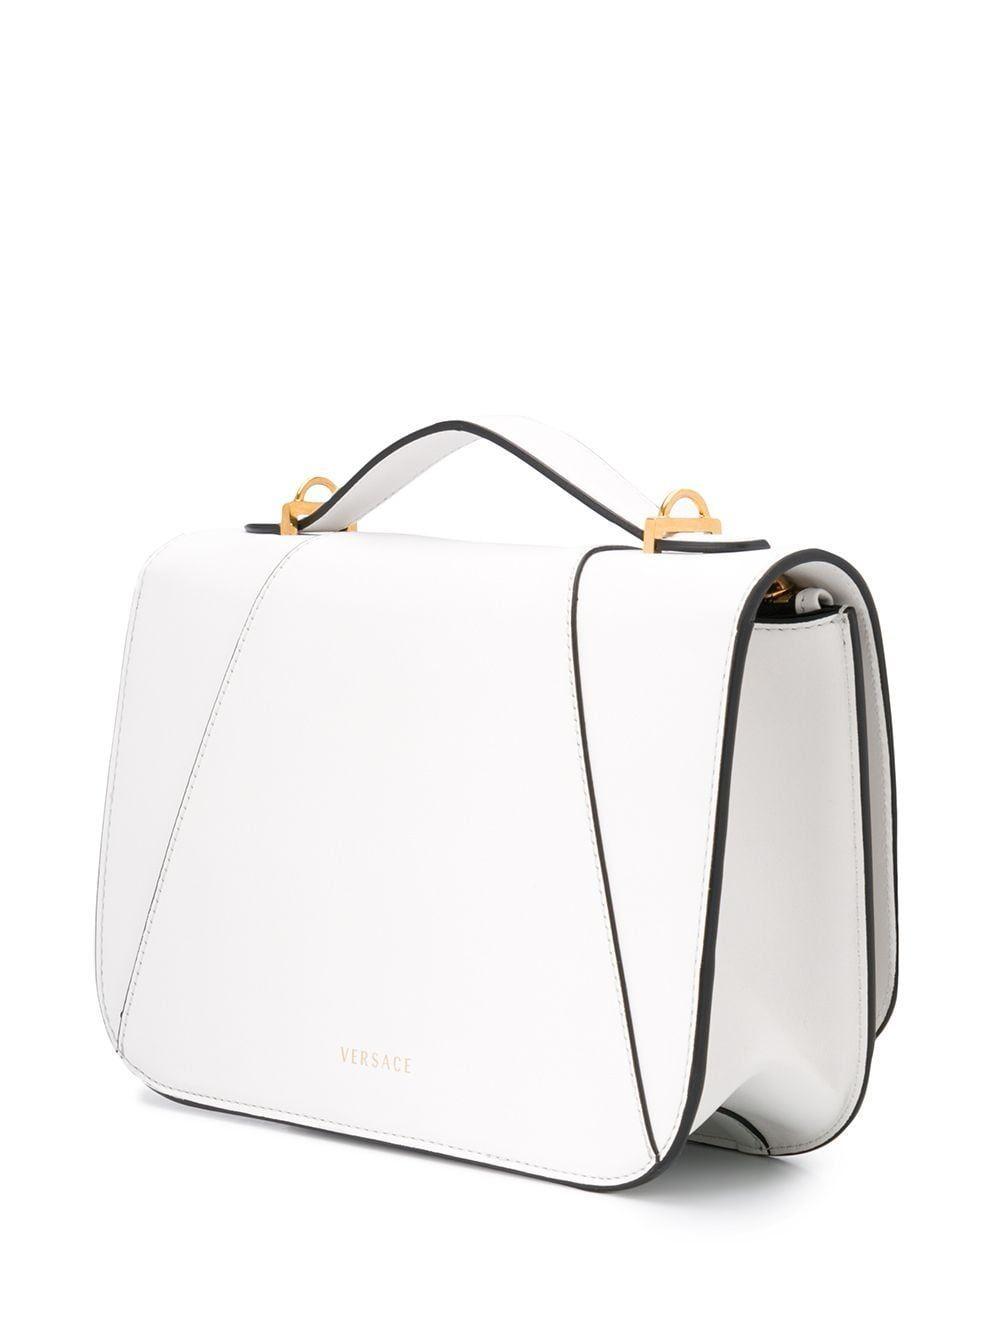 VERSACE WOMEN'S DBFG985D5VITK0AOT WHITE LEATHER SHOULDER BAG